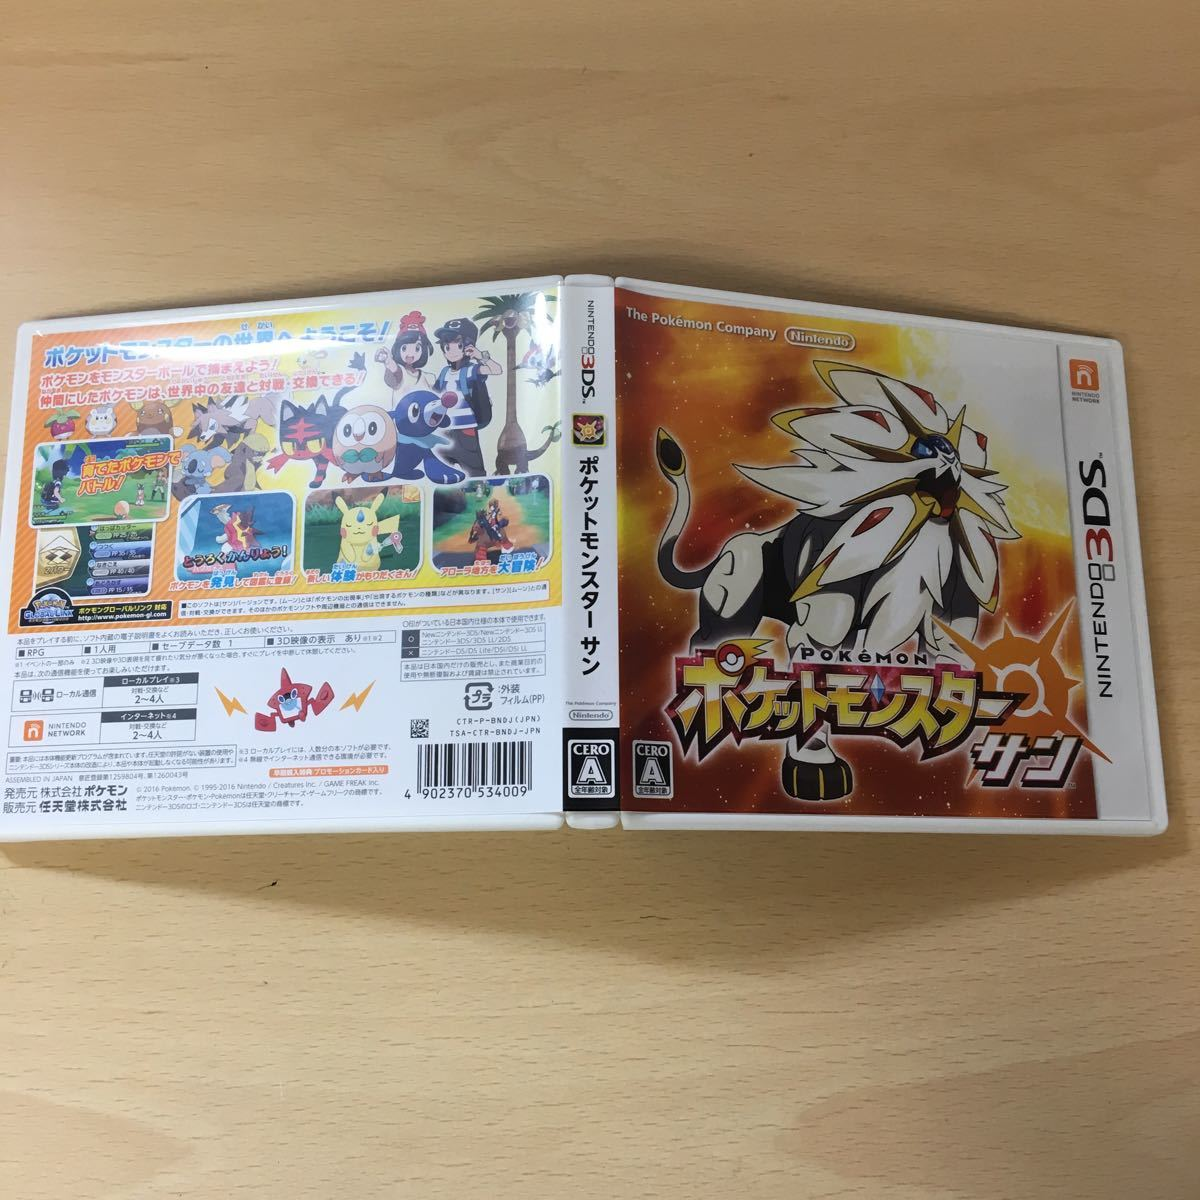 Nintendo 任天堂 3DS 3DSソフト ゼルダの伝説 時のオカリナ 世界樹の迷宮V ポケットモンスター サン_画像2